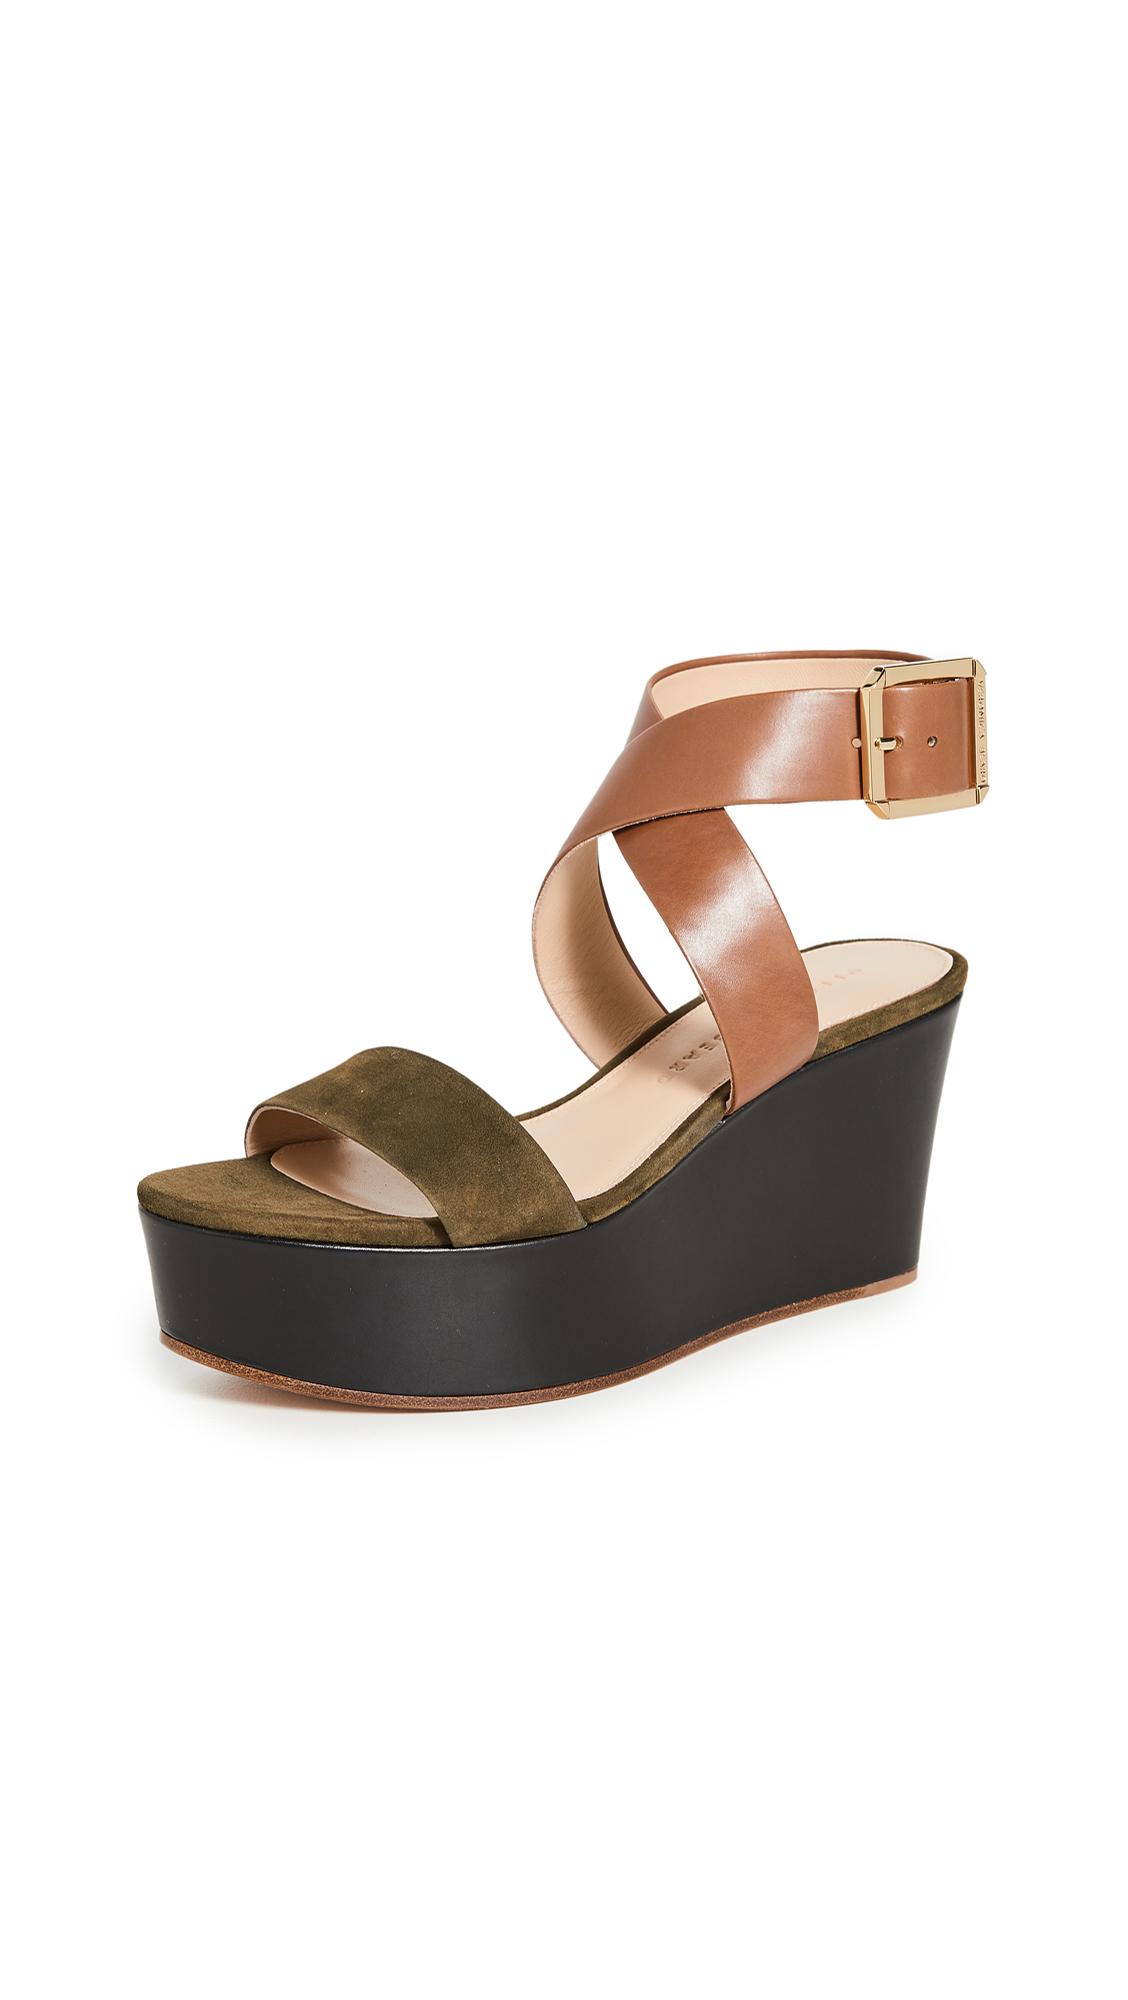 Veronica Beard Hurley Sandals - 30% Off Sale